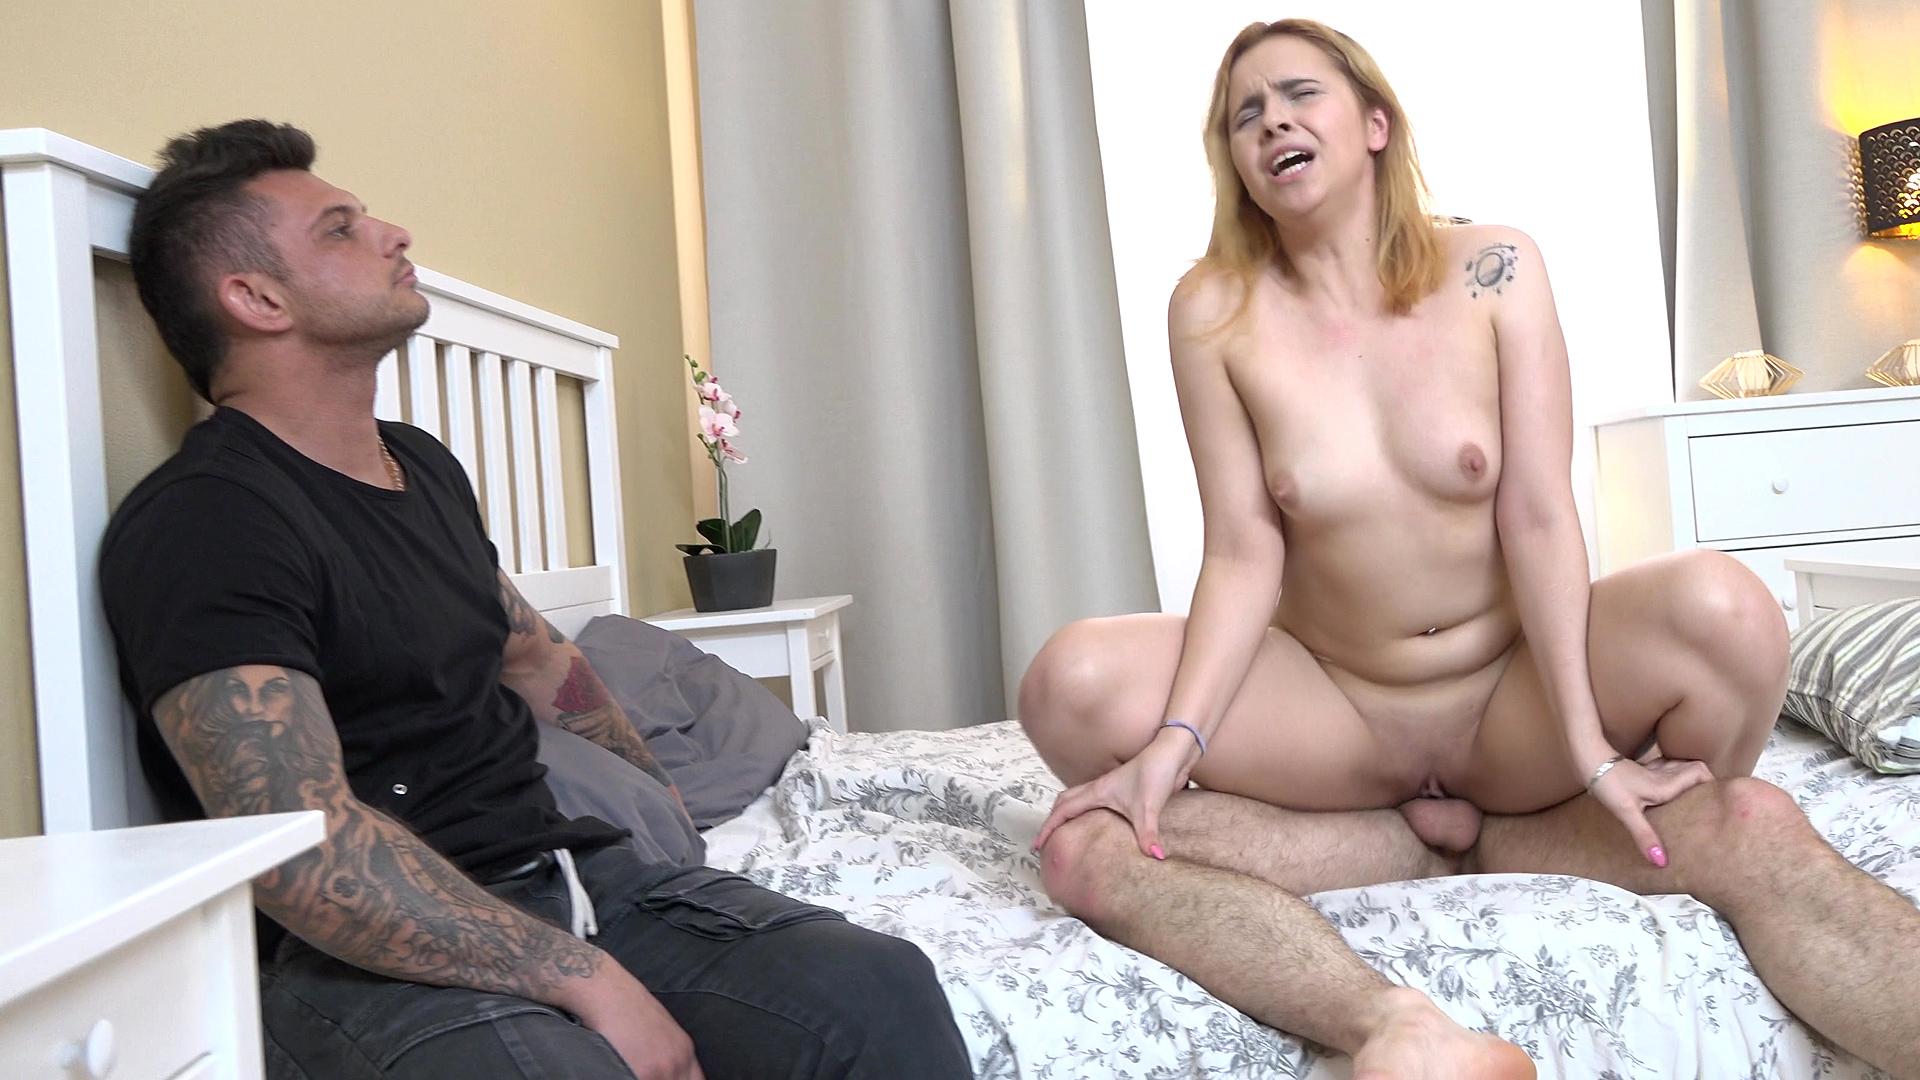 Redhead gf fuck for rent money aletta ocean hd porn  Karry Slot